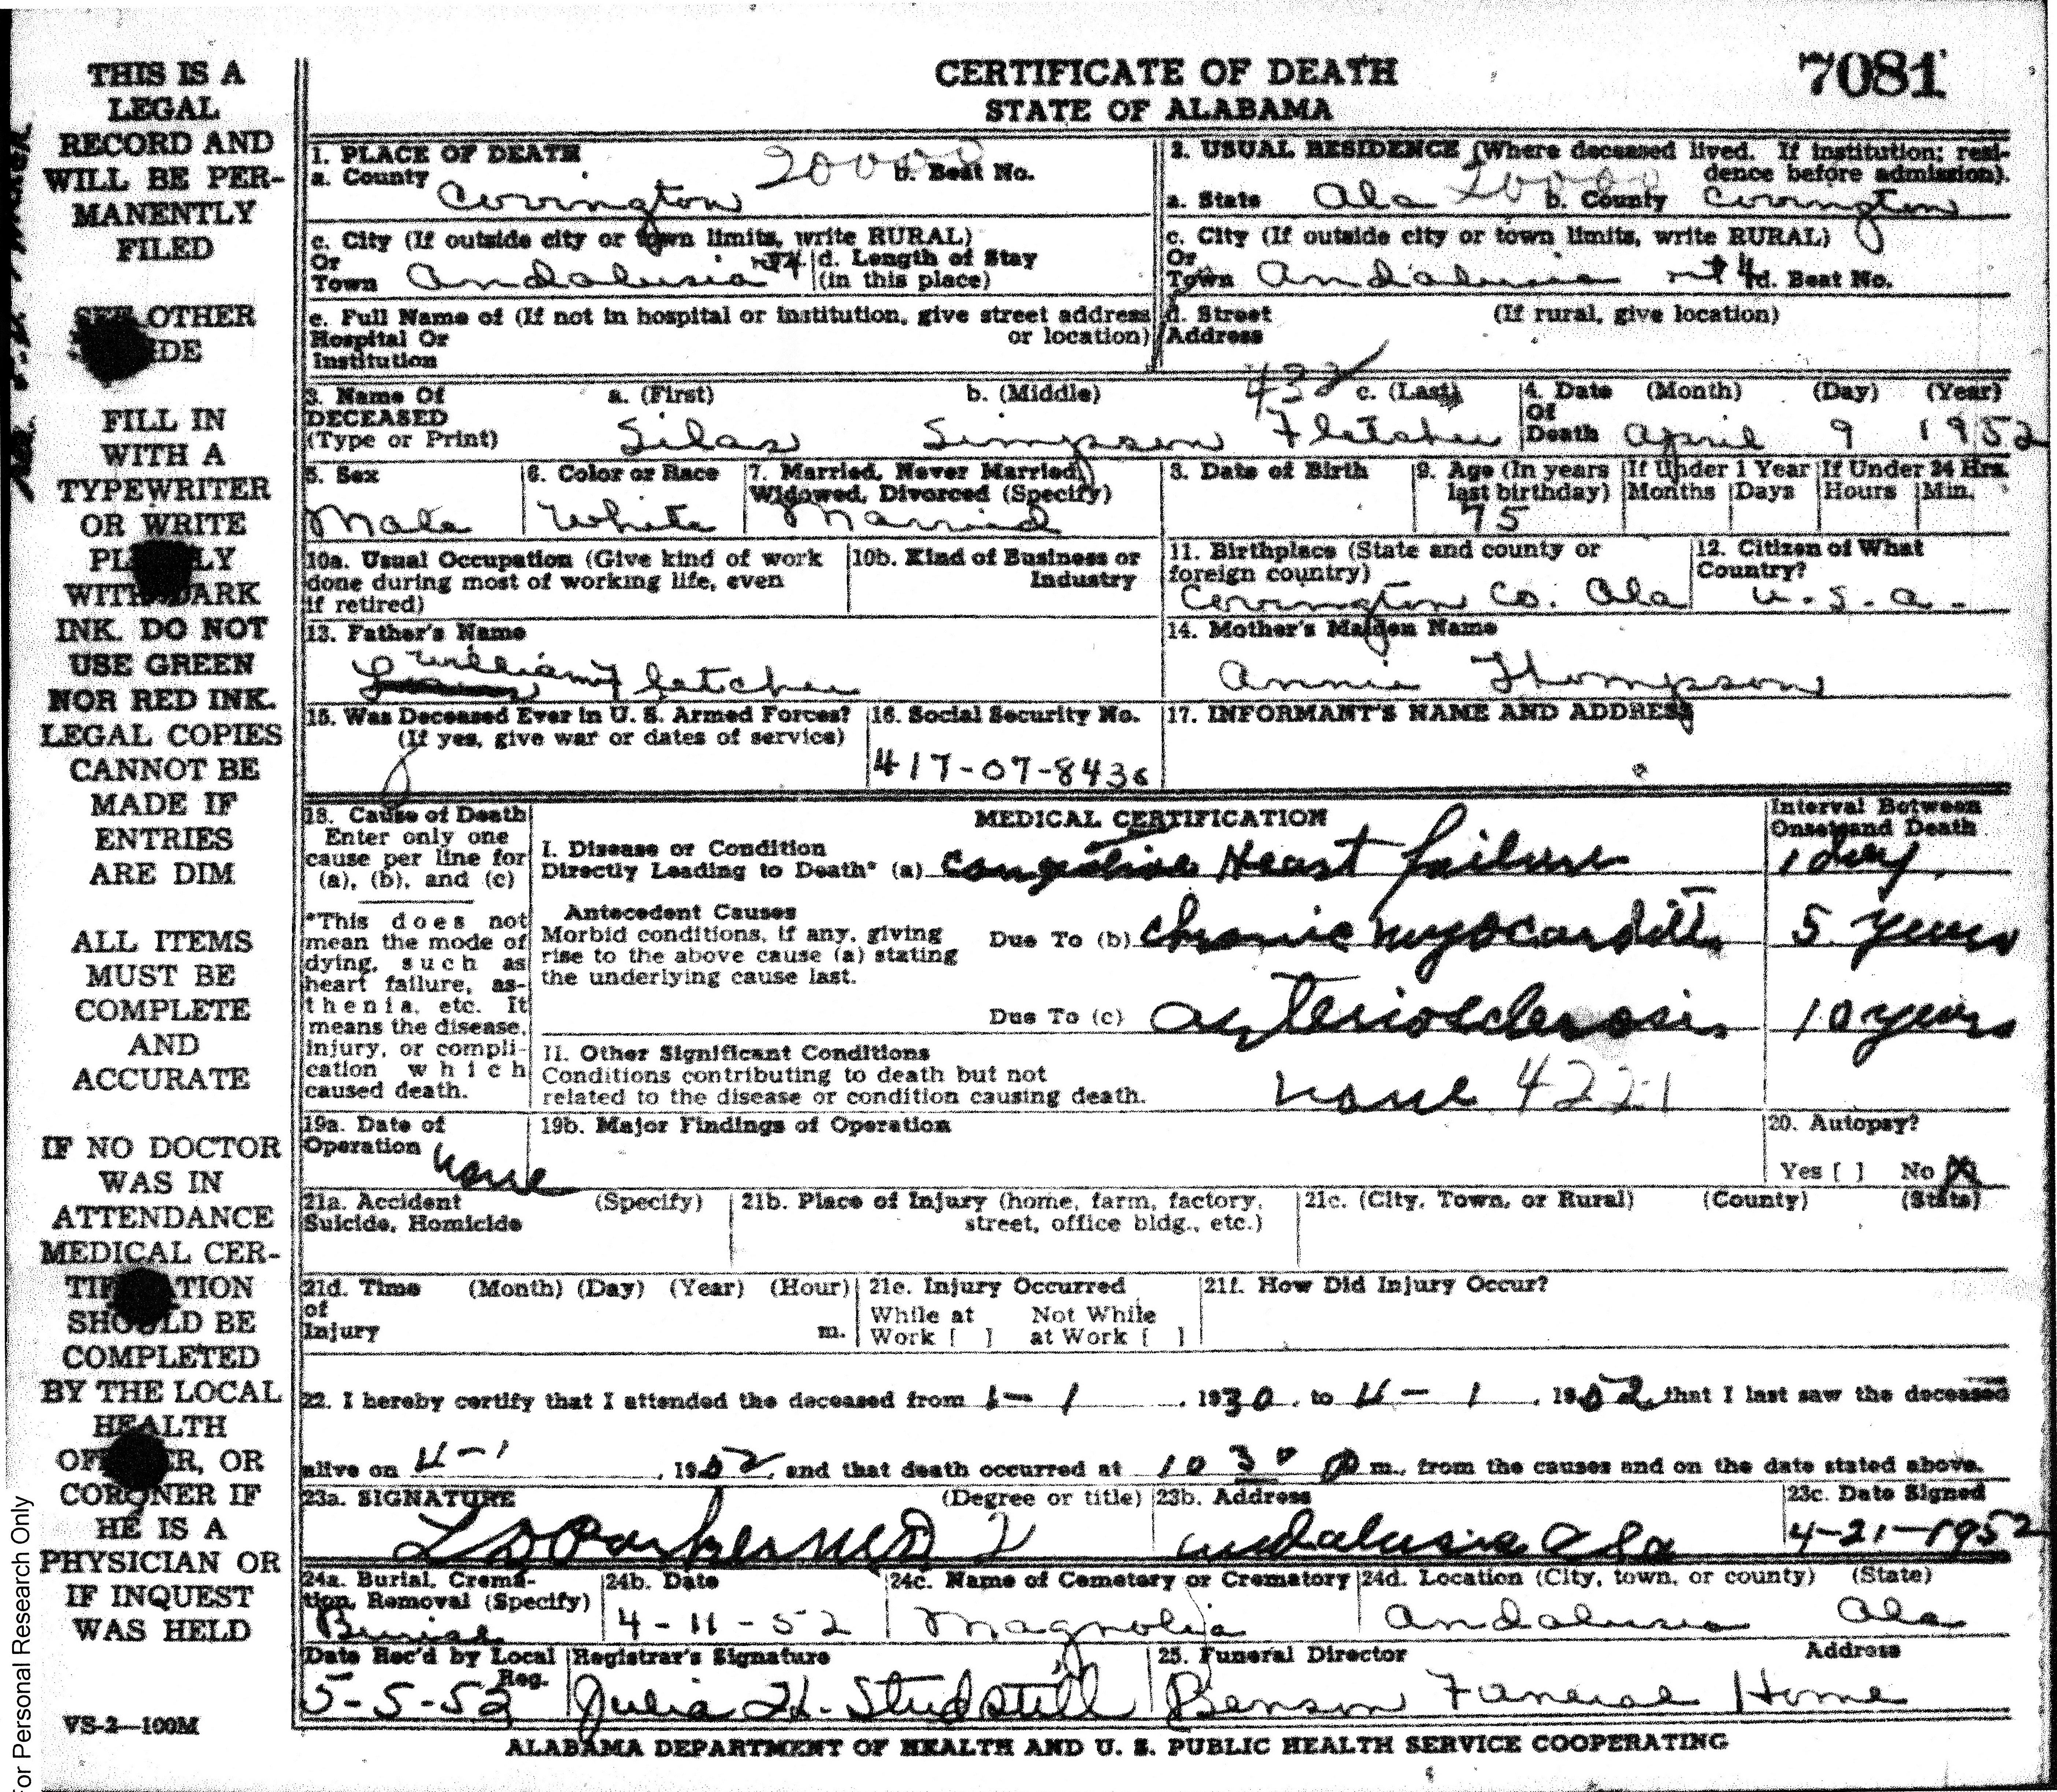 Silas Fletcher death certificate